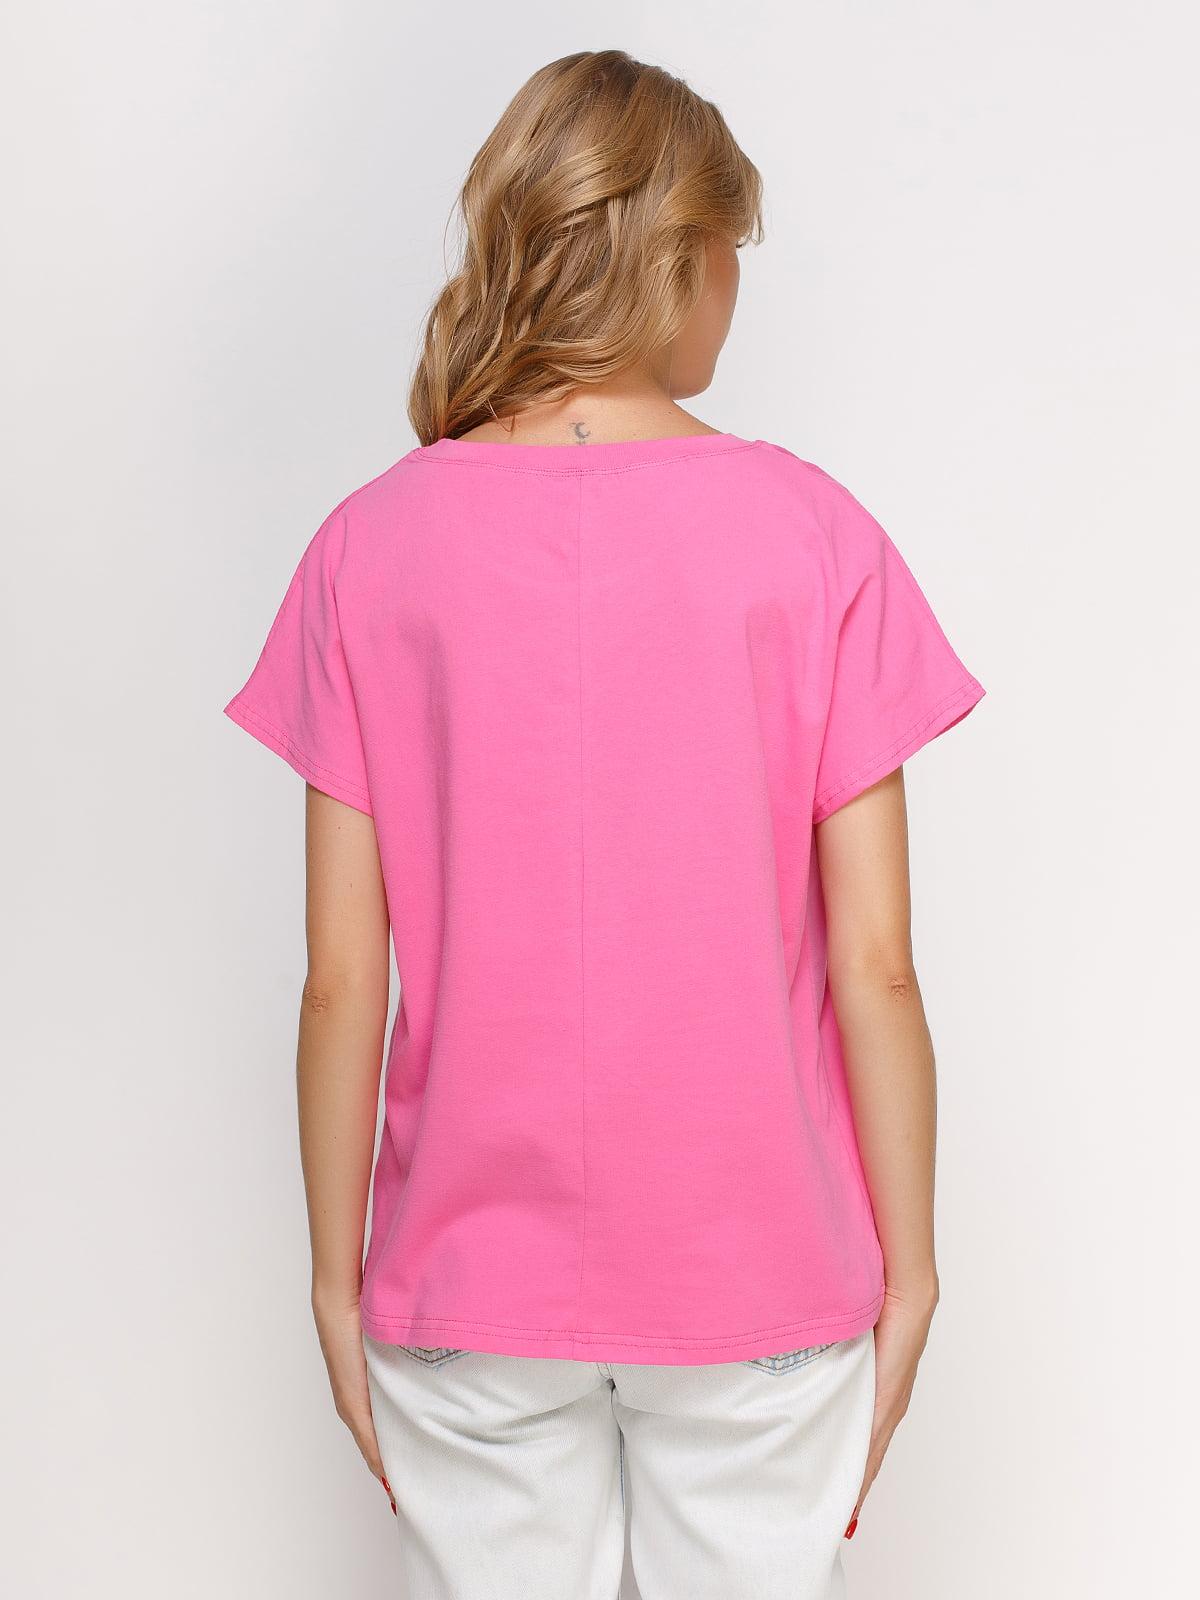 Футболка рожева з принтом | 4578217 | фото 2